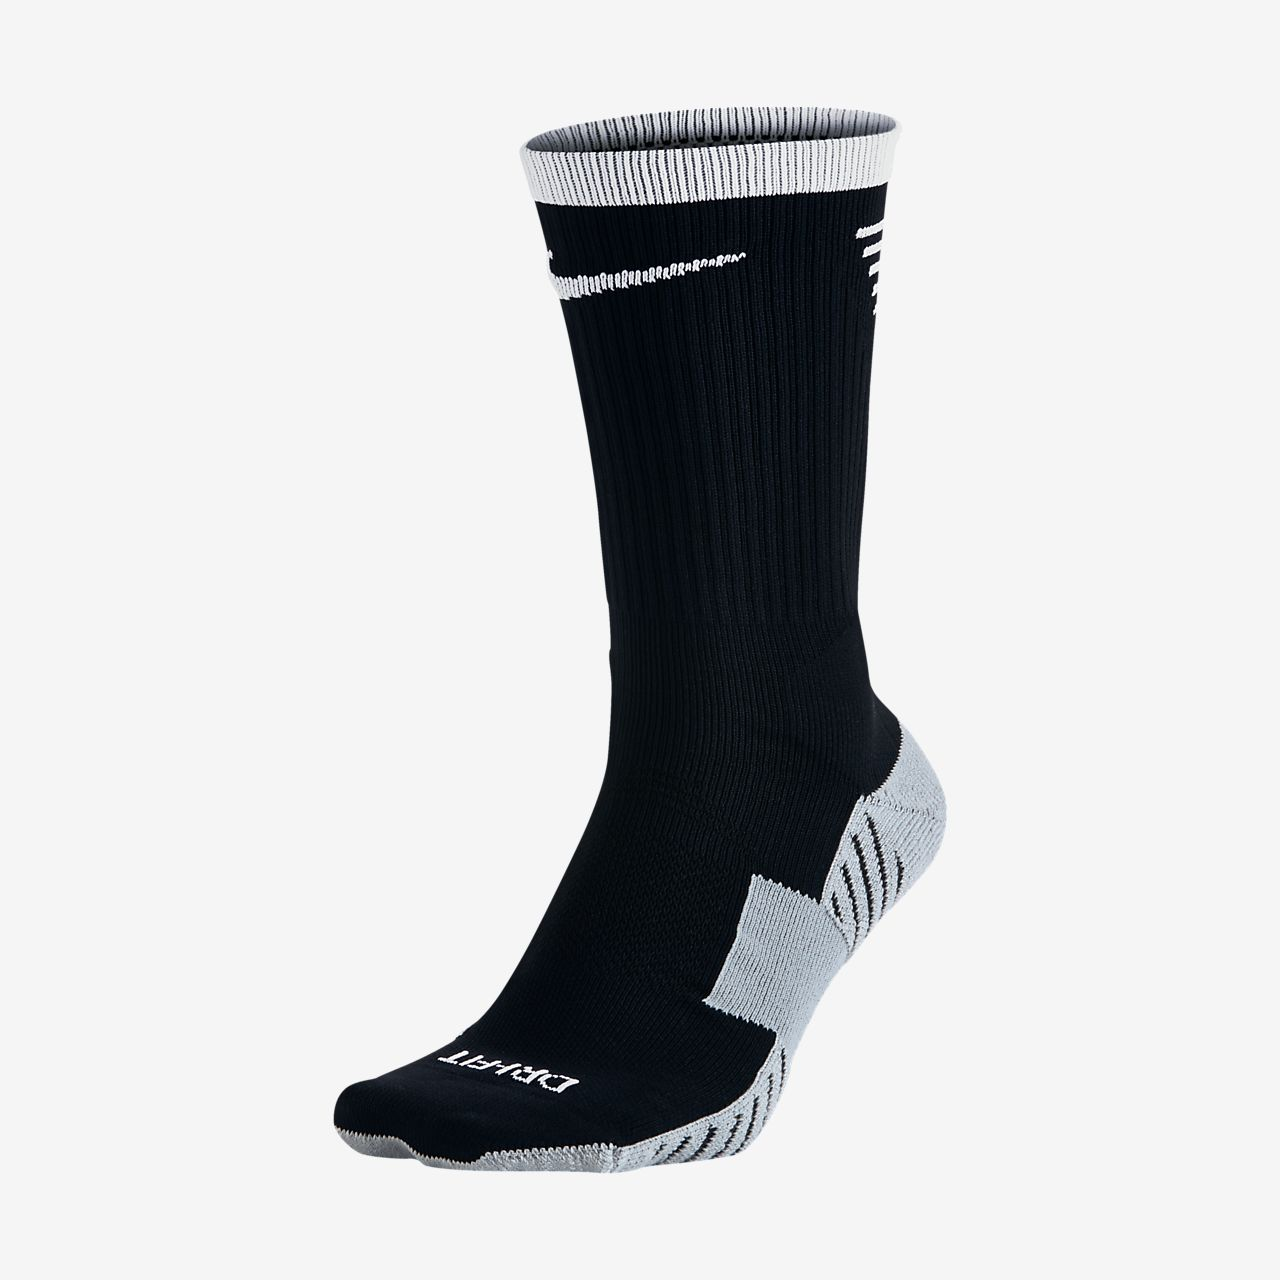 Chaussettes de football mi-mollet Nike Dry Squad